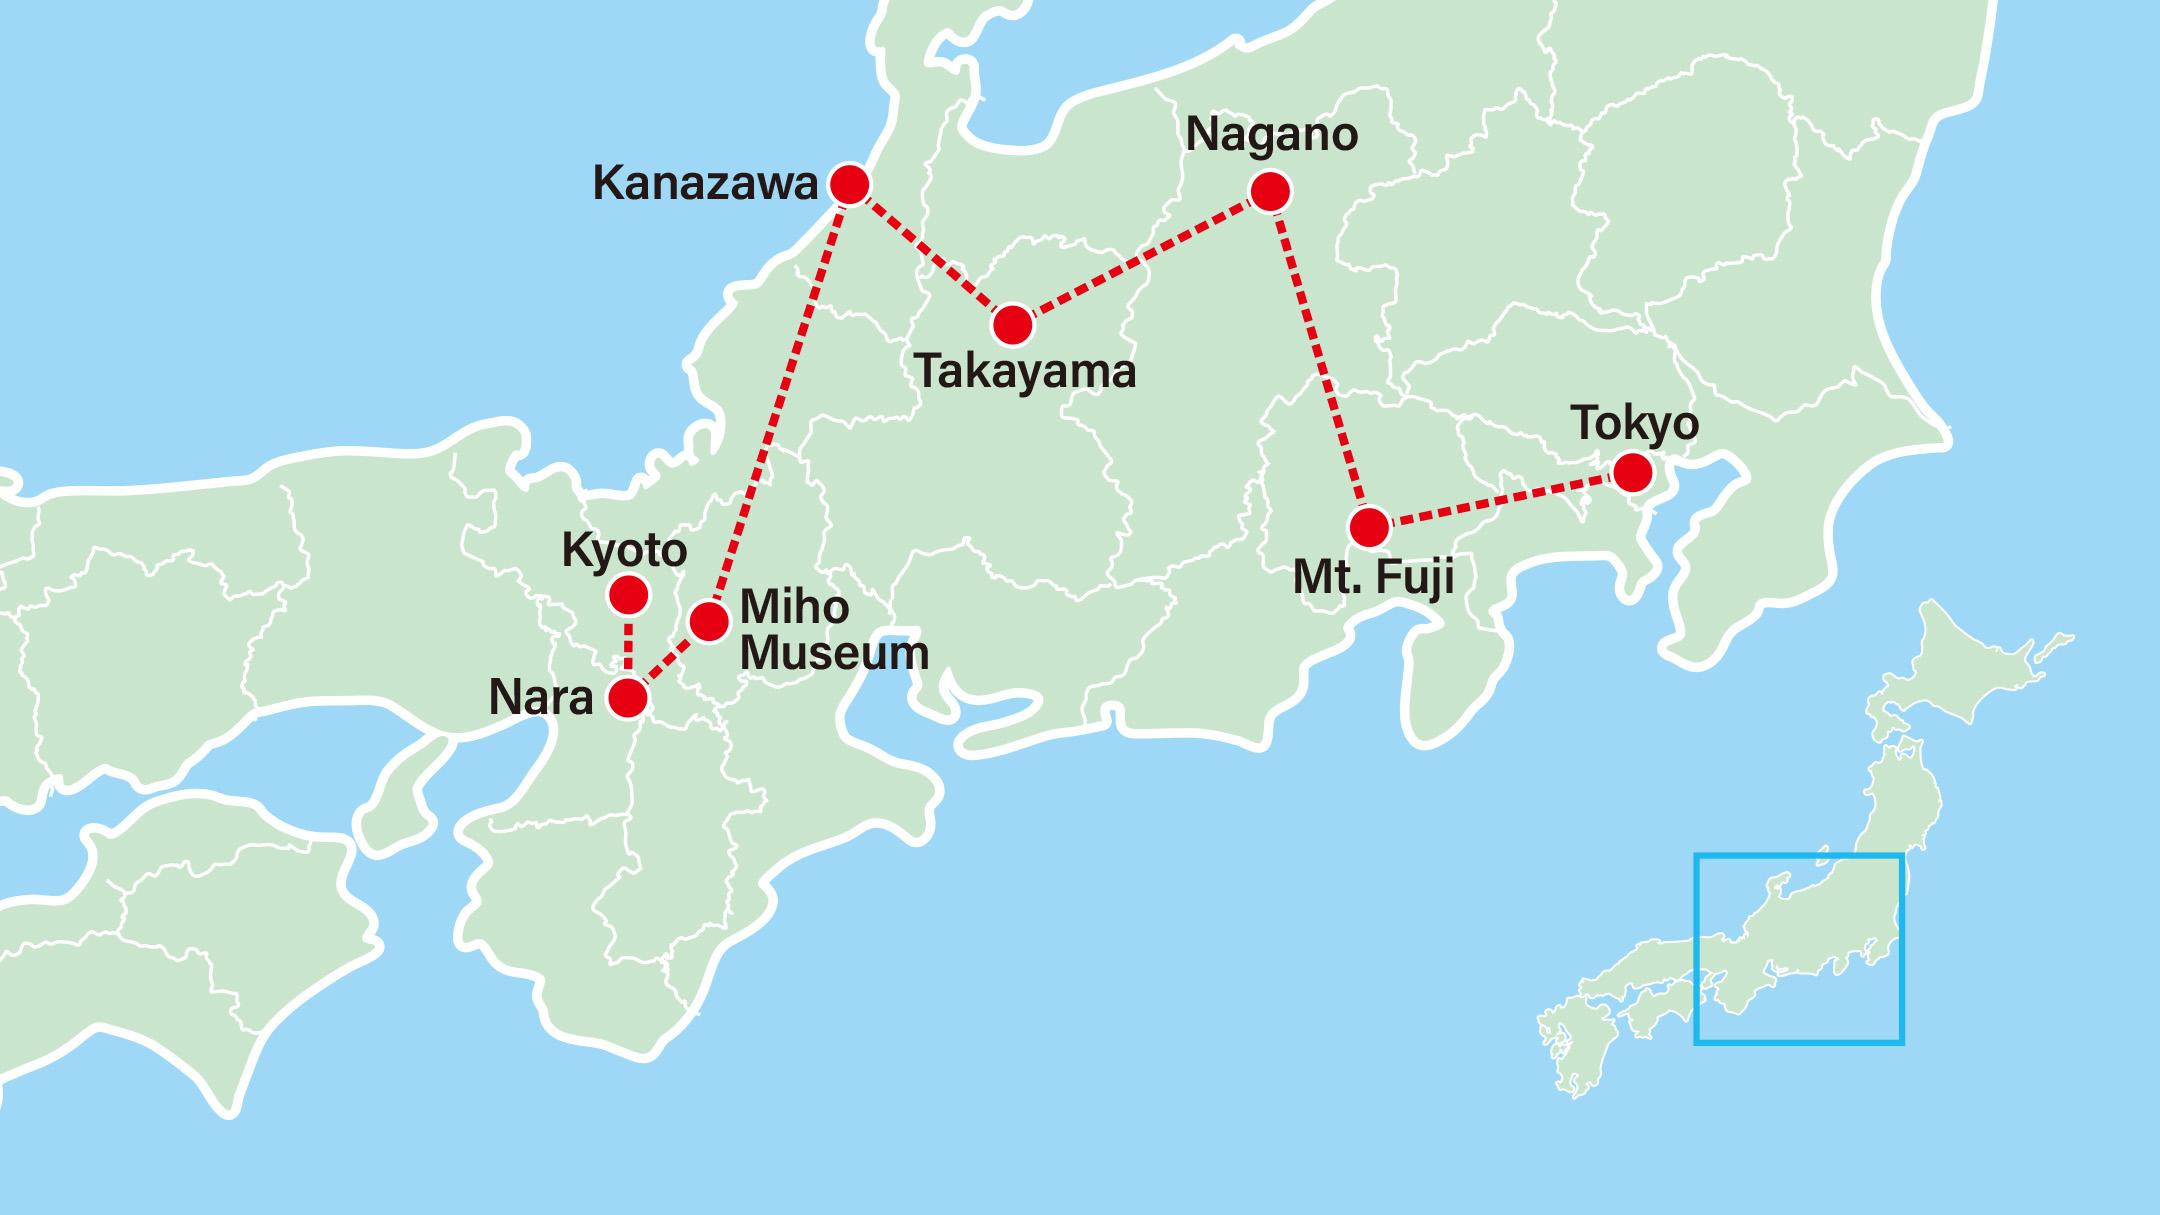 Takayama Old Town & Villages 9 Days-Tokyo-Lake Kawaguchi-Nagano-Takayama-Kanazawa-Miho Museum-Nara-Kyoto